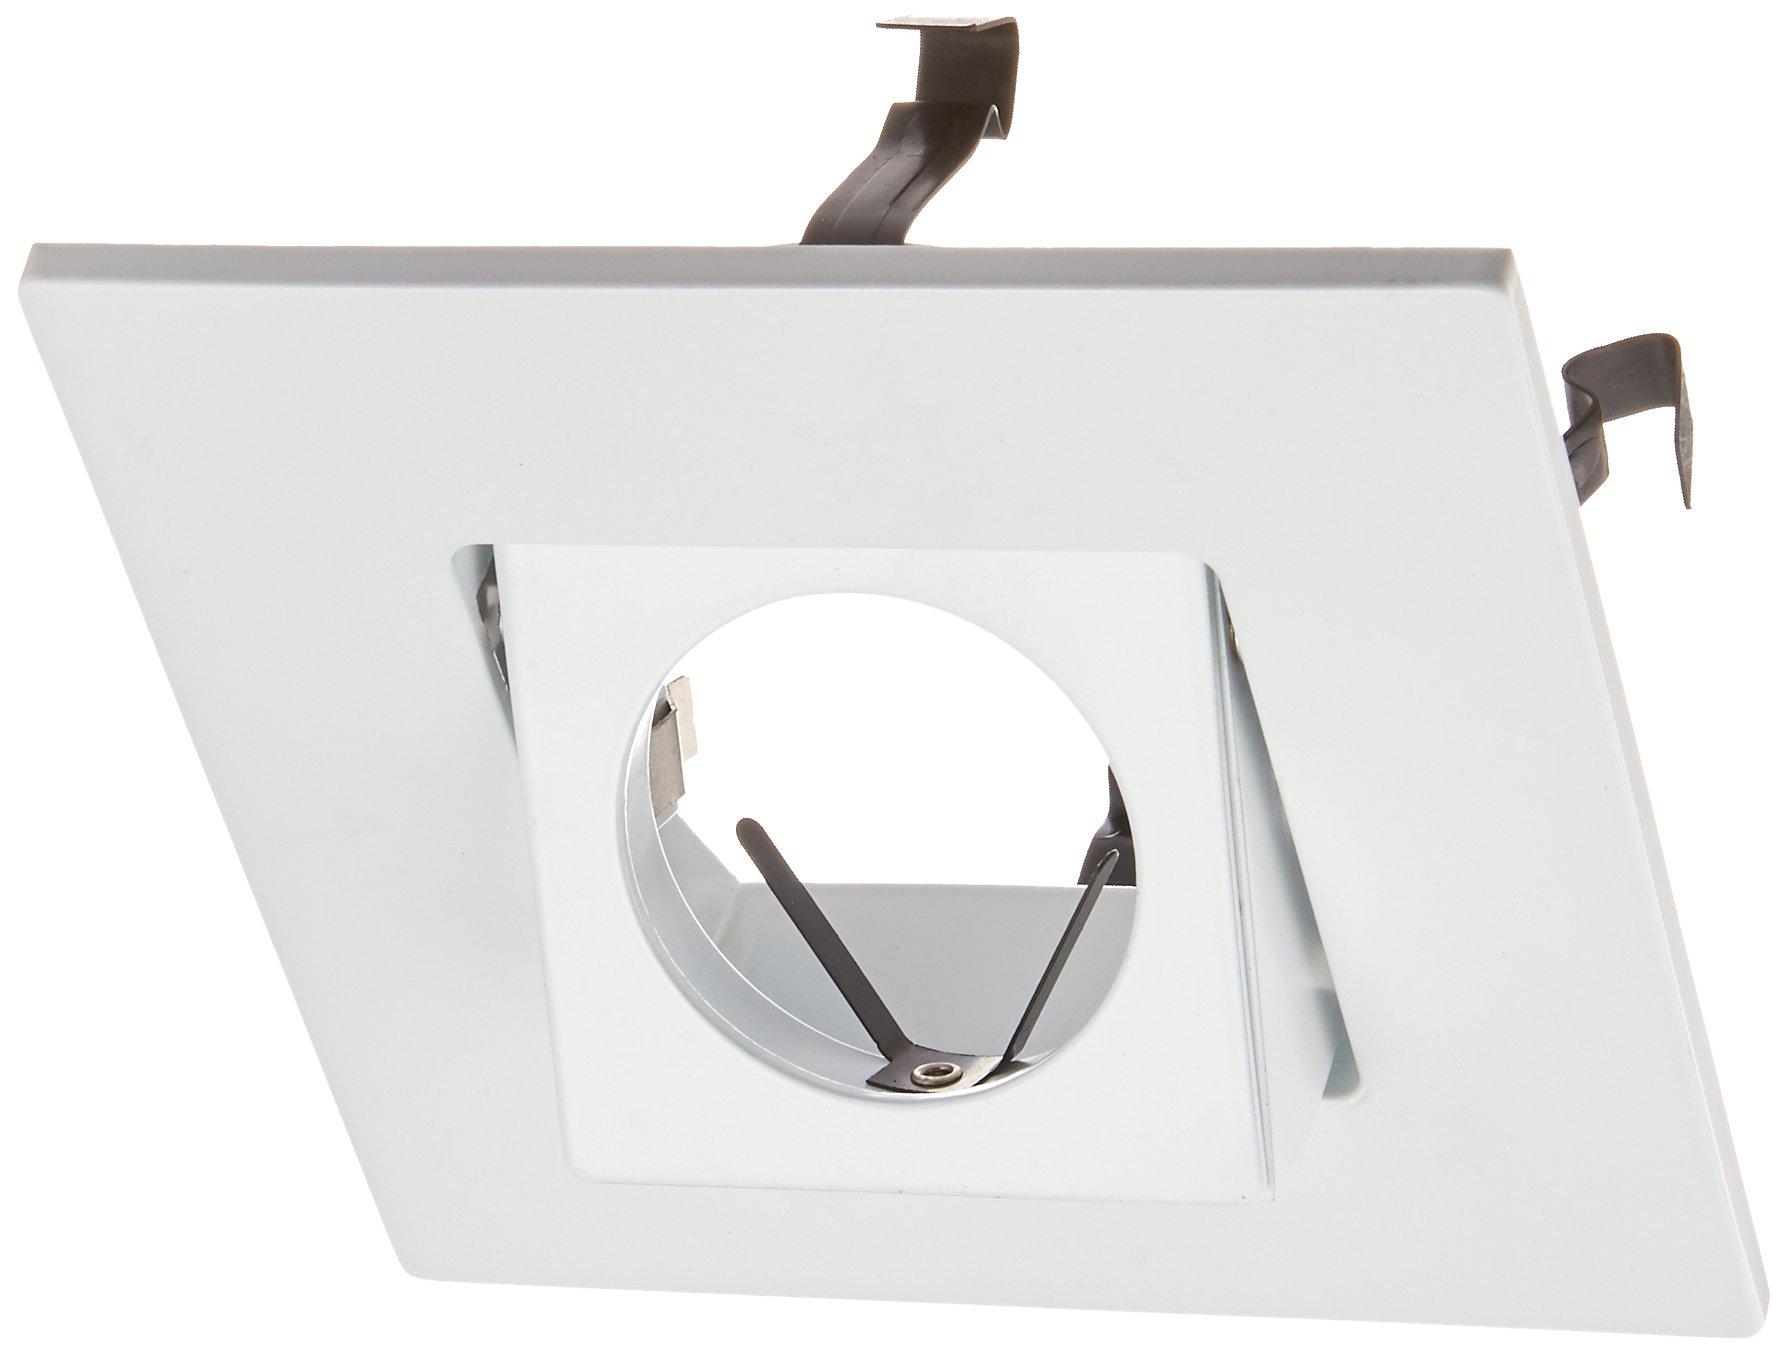 WAC Lighting HR-D416-WT Recessed Low Voltage Trim Adjust Spot